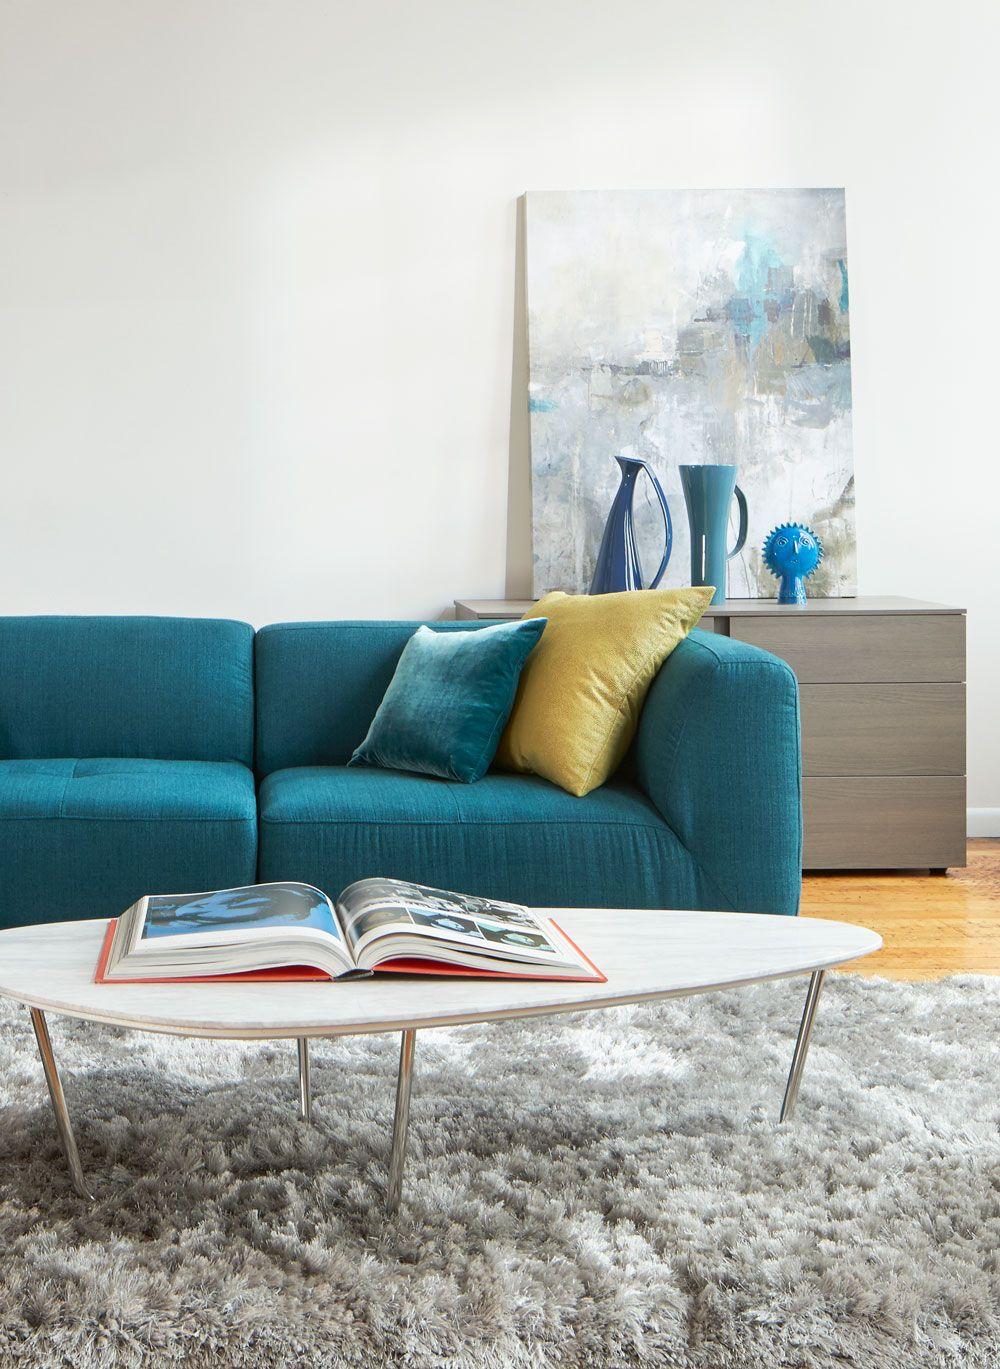 malibu modular sectional | ottomans, construction and living rooms